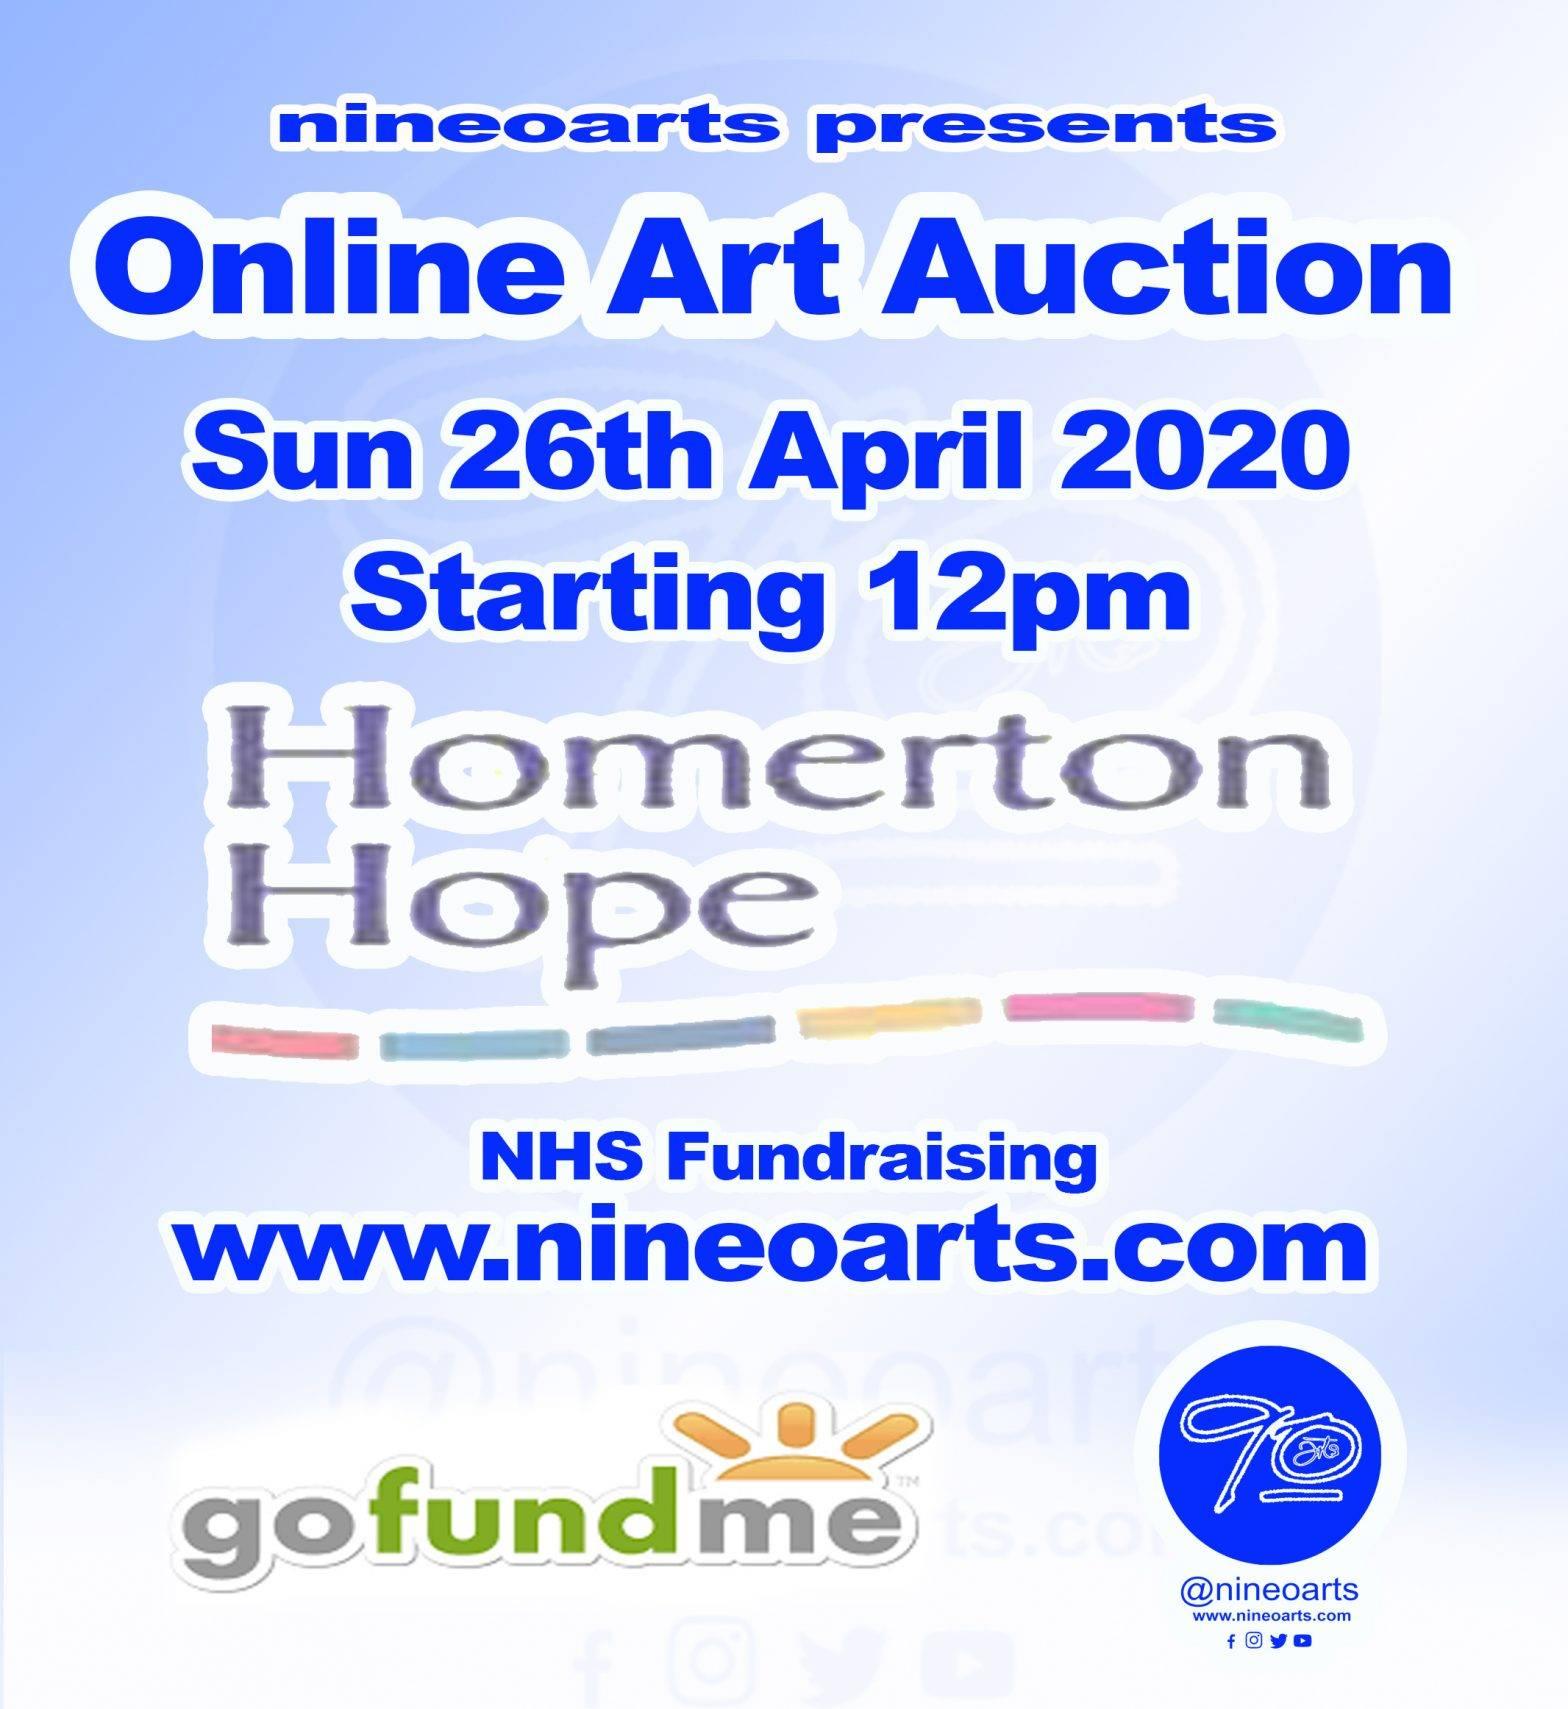 NHS Fundraiser Homerton hospital